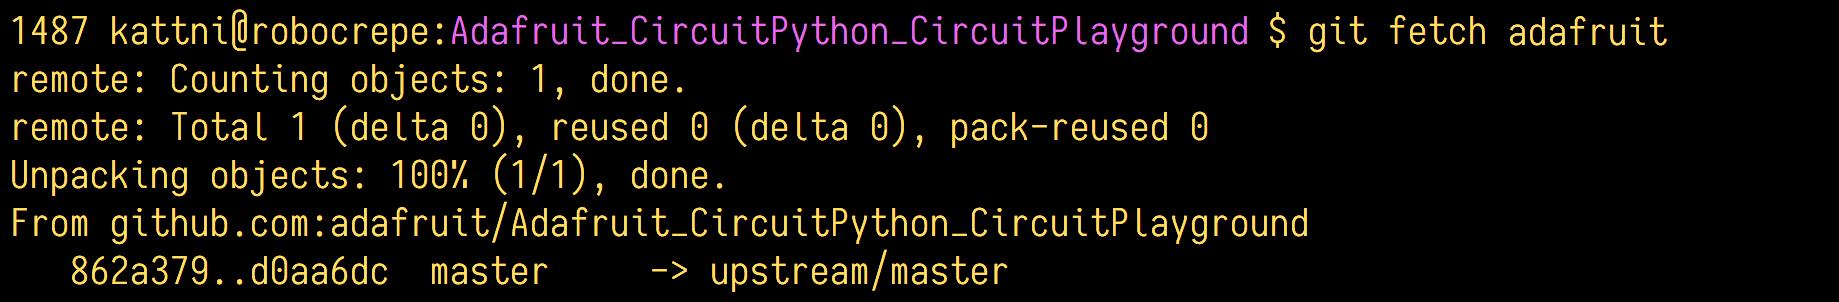 circuitpython_GitUpdateGitFetchAdafruit.png